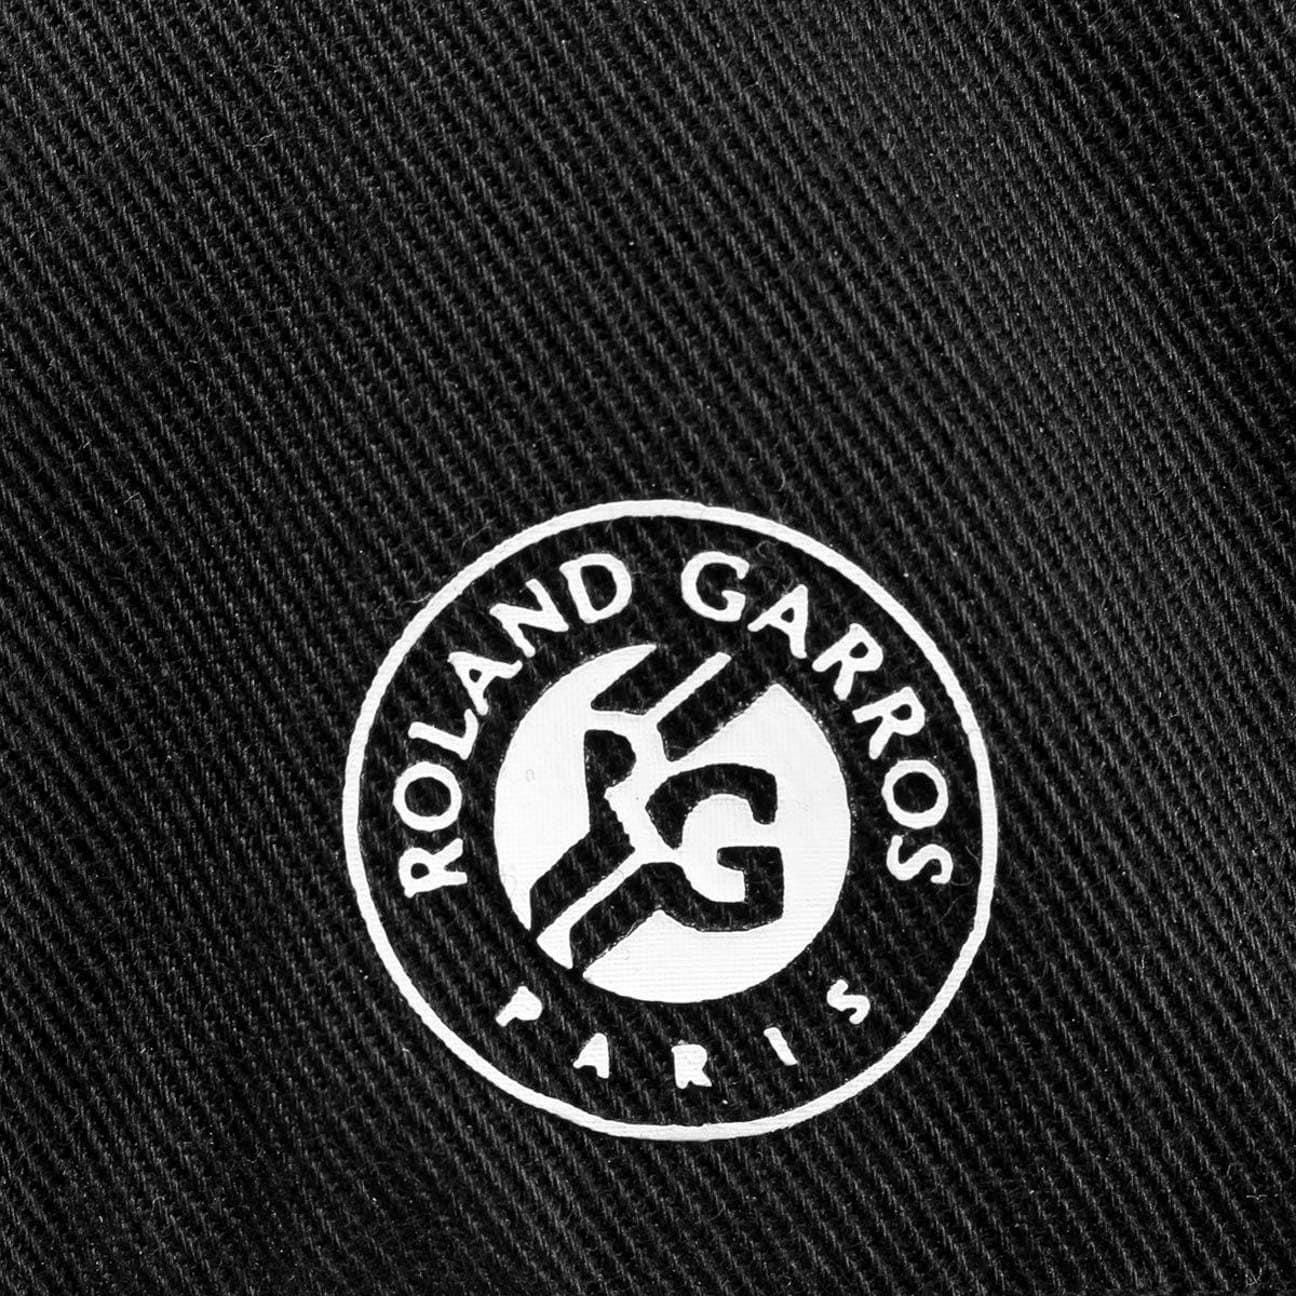 Roland Garros Leisure Cap By Adidas Gbp 16 95 Gt Hats